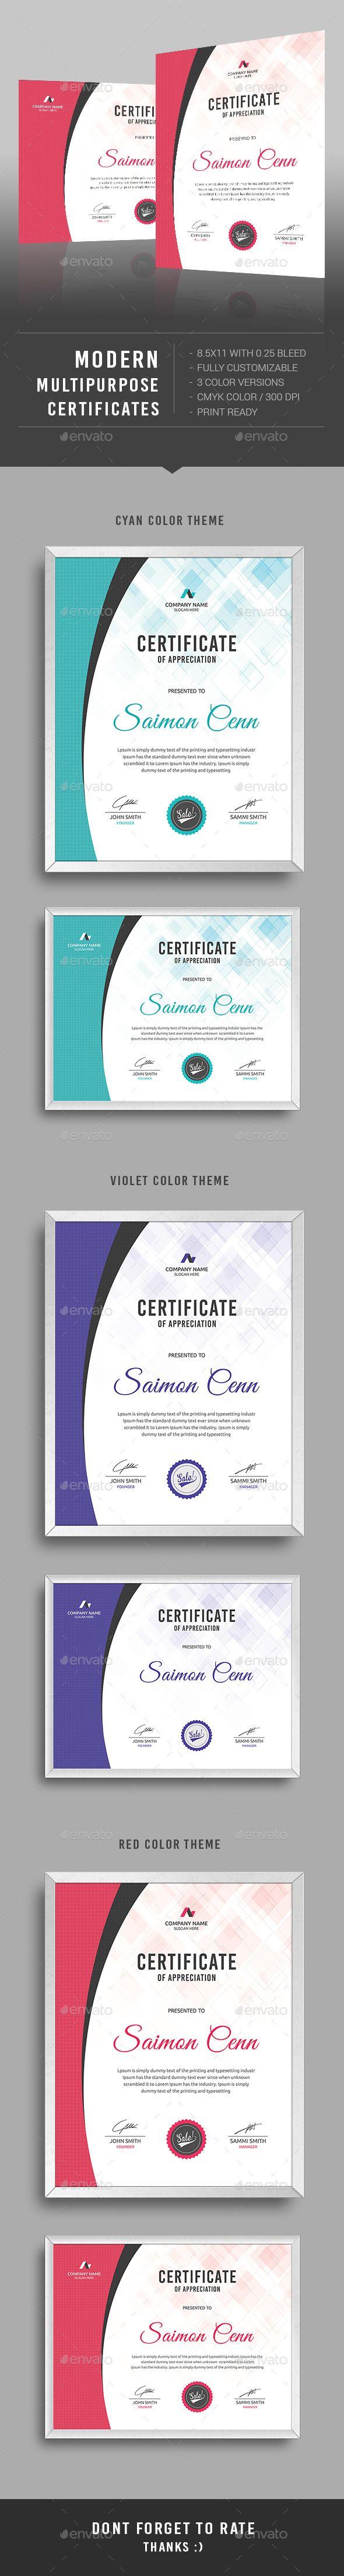 Modern Multipurpose Certificate PSD Design I Certificate Templates for multipurpose usage I Download: https://graphicriver.net/item/certificate/12814074?ref=jpixel55